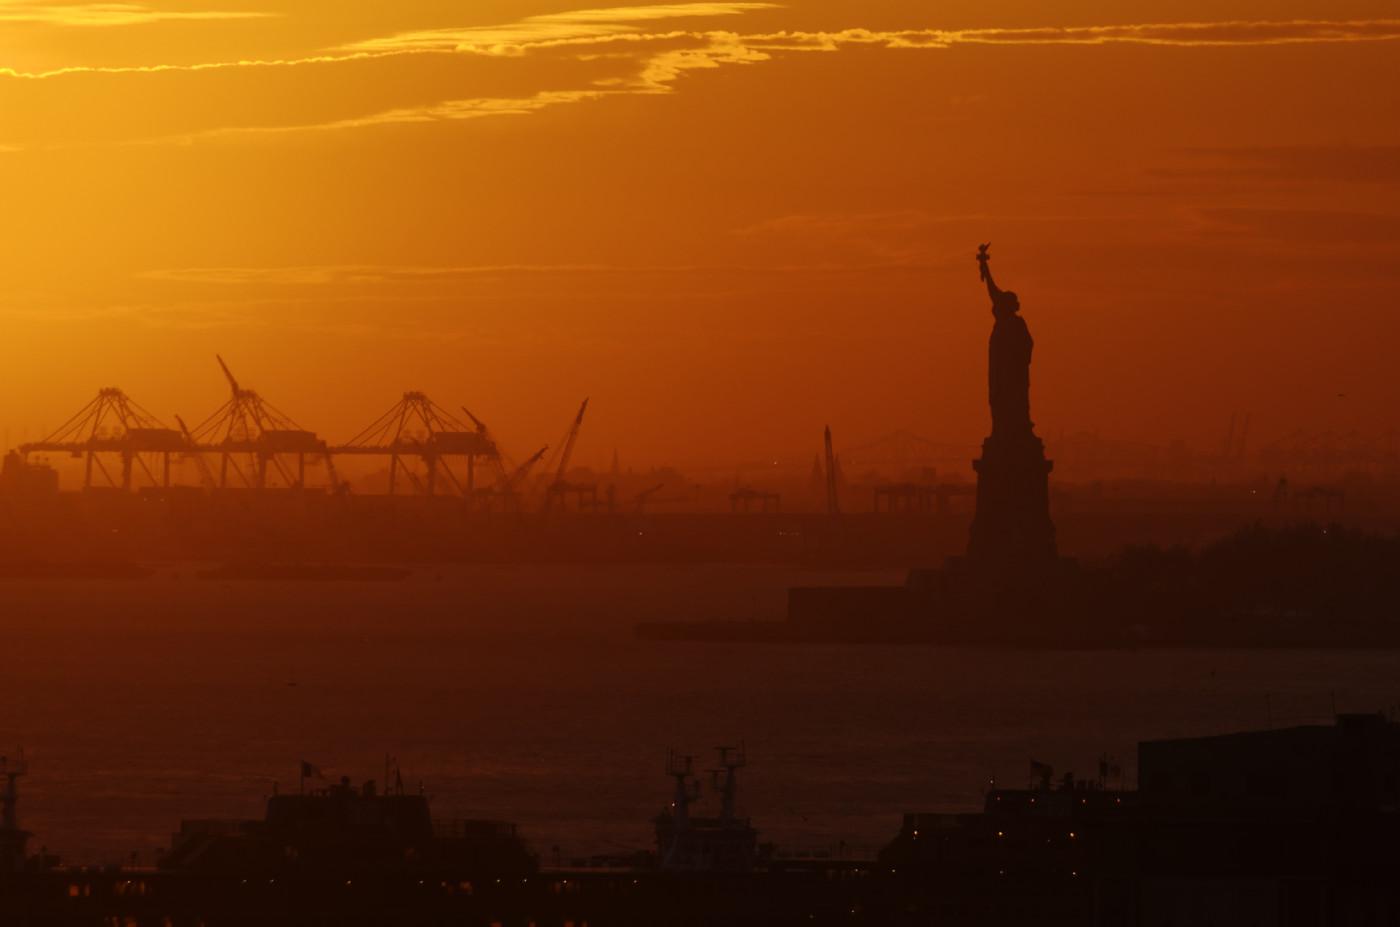 New York - Statue of Liberty from the Brooklyn Bridge